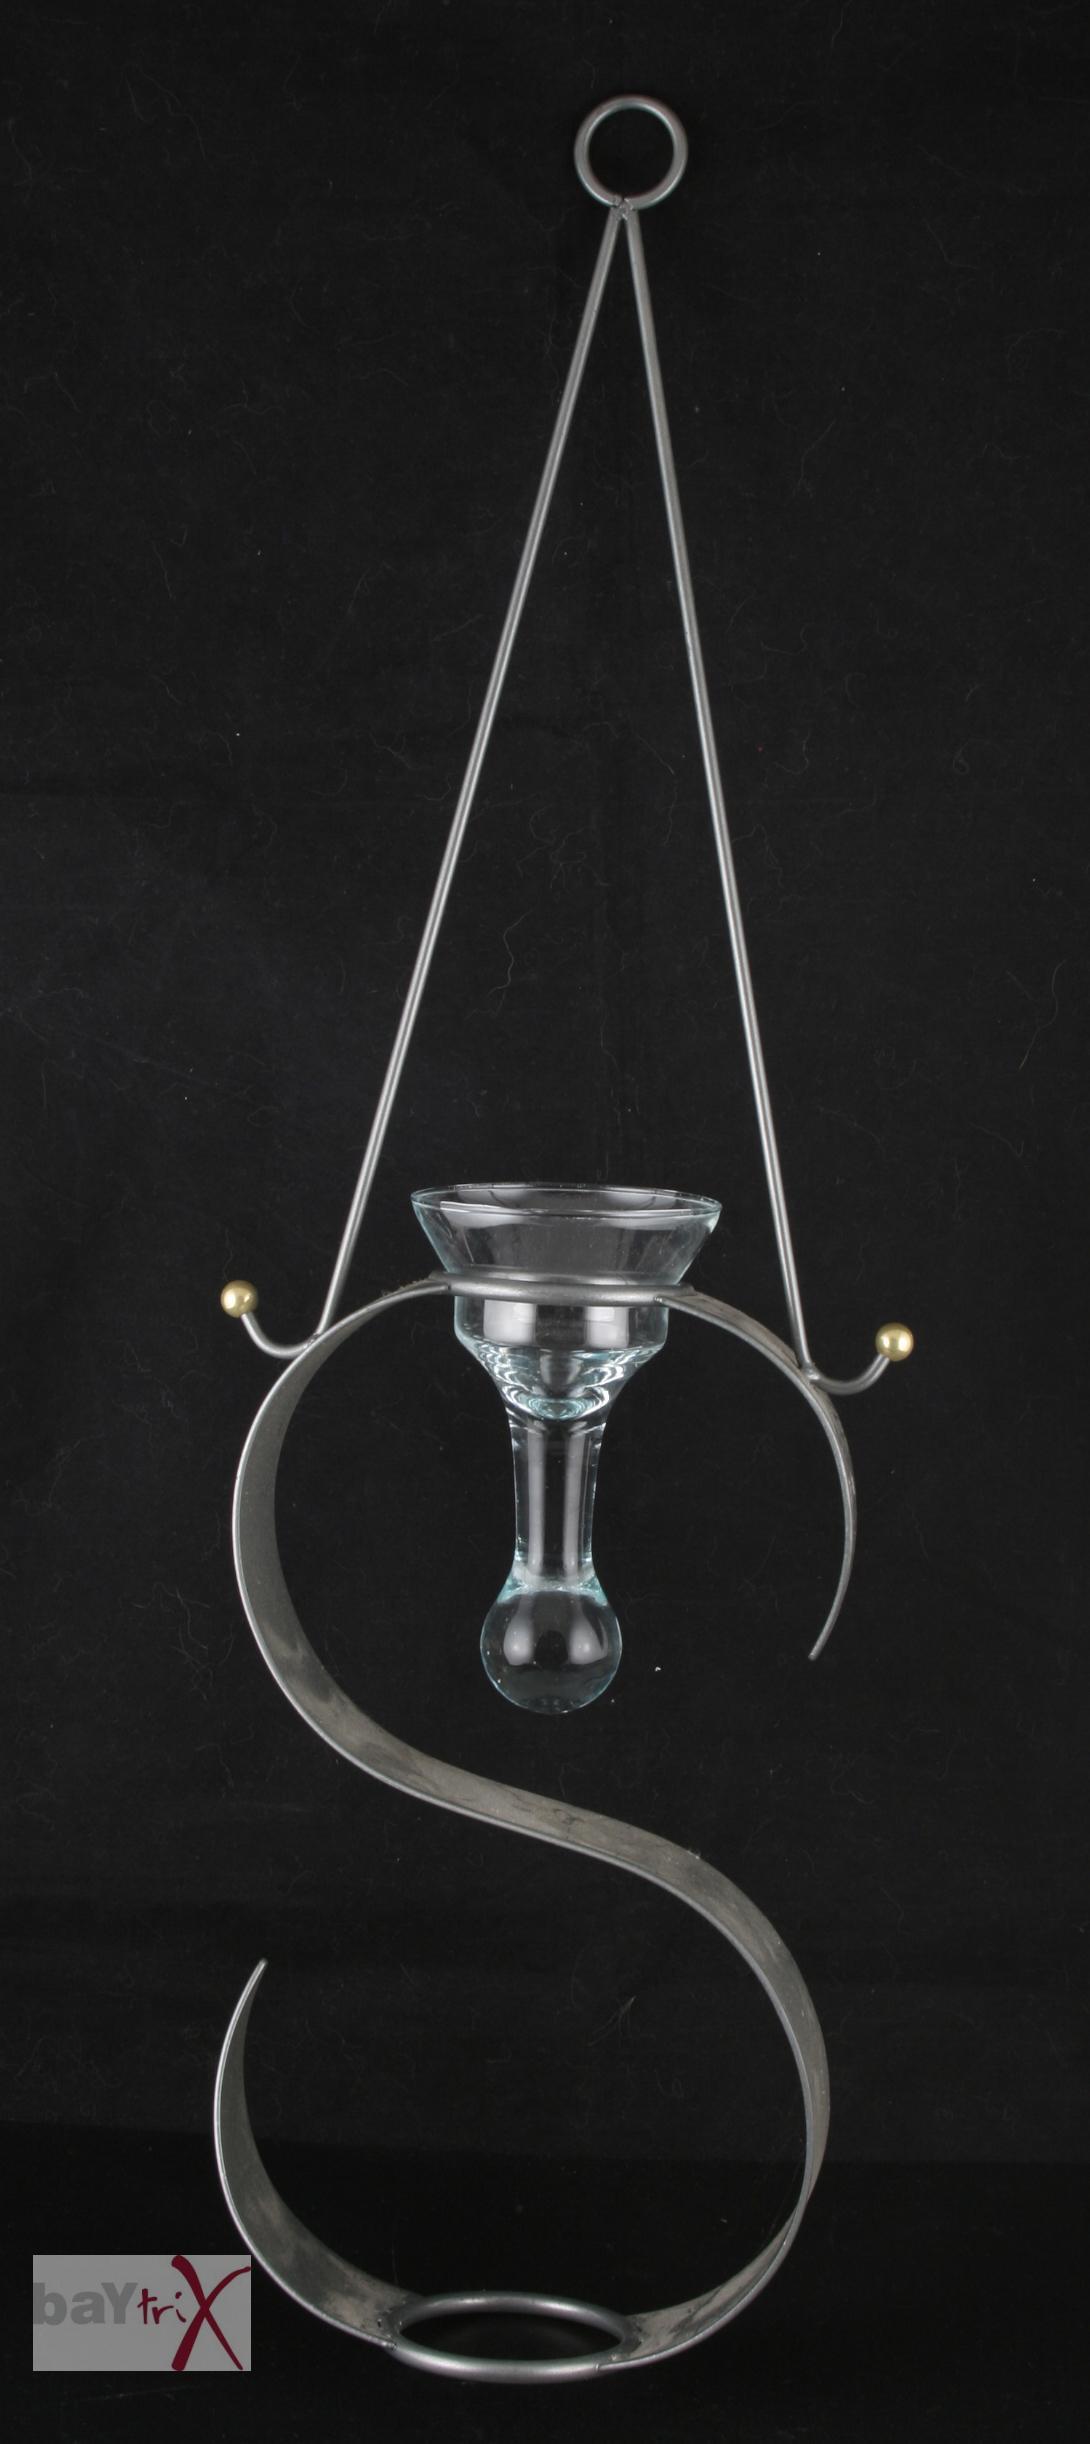 h ngeleuchter f r kerzer kerzenhalter metall mit glaseinsatz h he ca 63 cm ebay. Black Bedroom Furniture Sets. Home Design Ideas